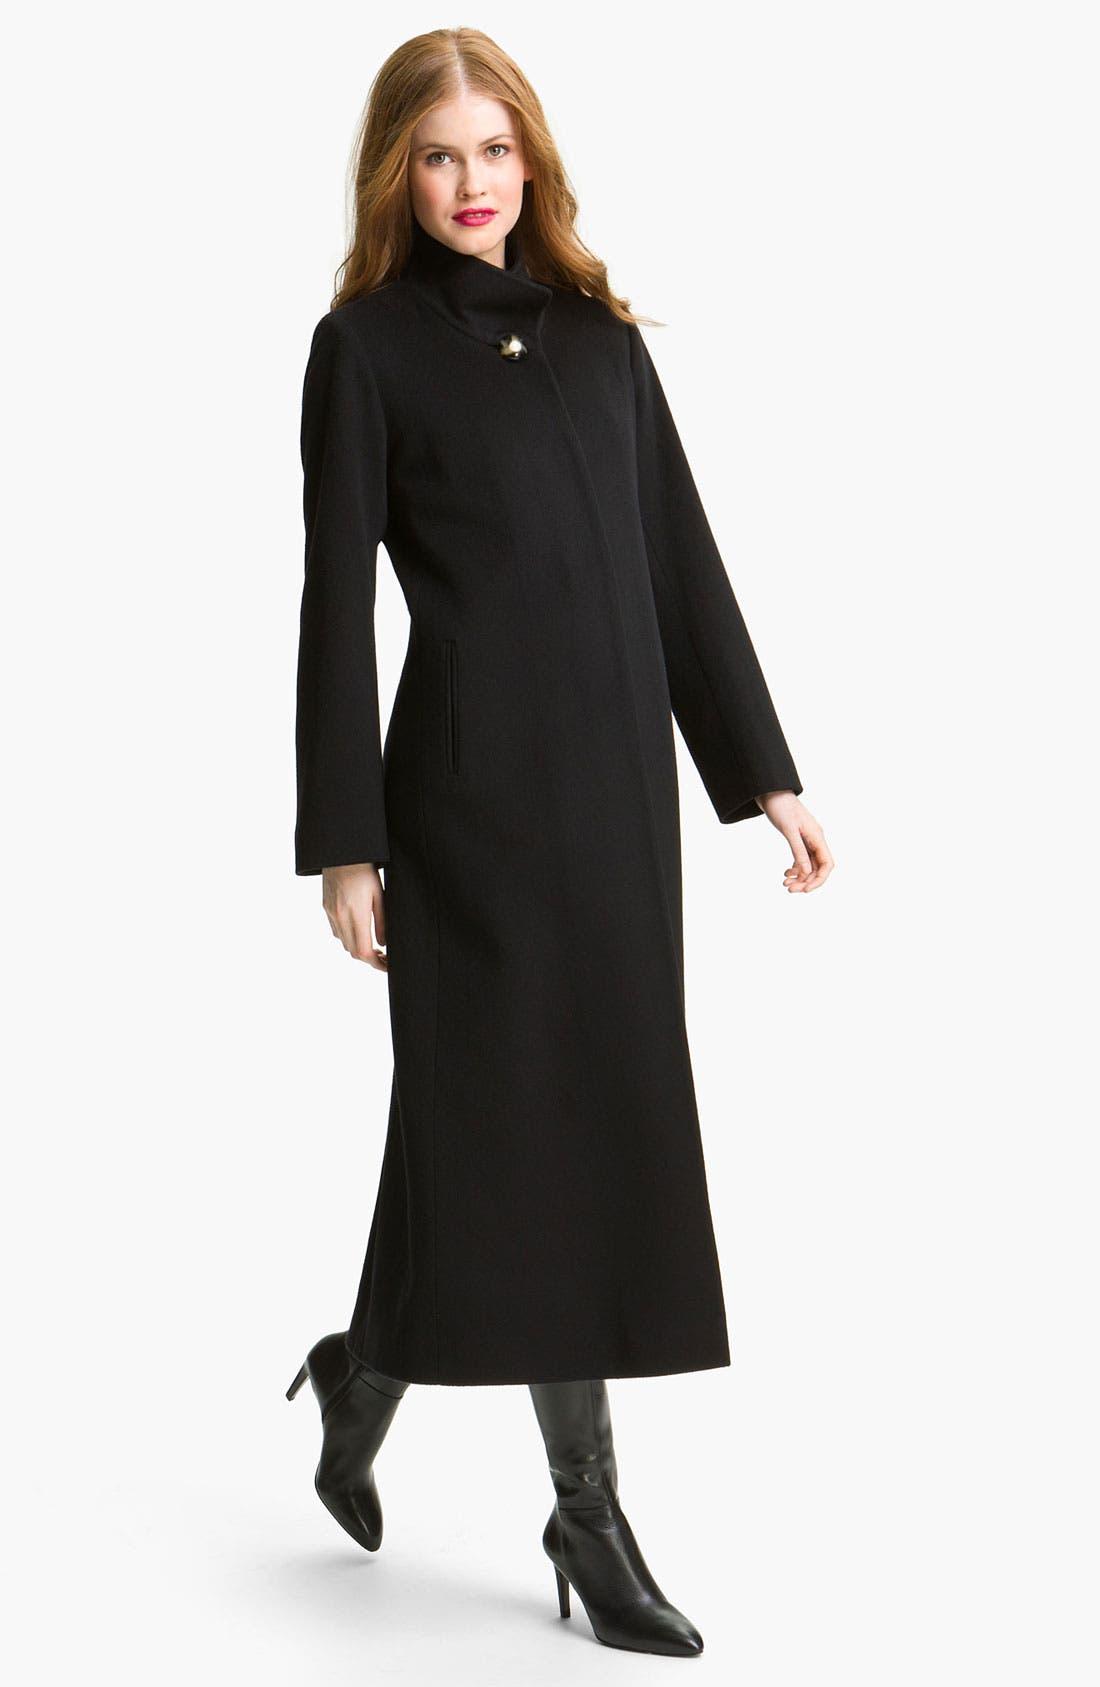 Alternate Image 1 Selected - Fleurette Stand Collar Long Wool Coat (Online Exclusive)